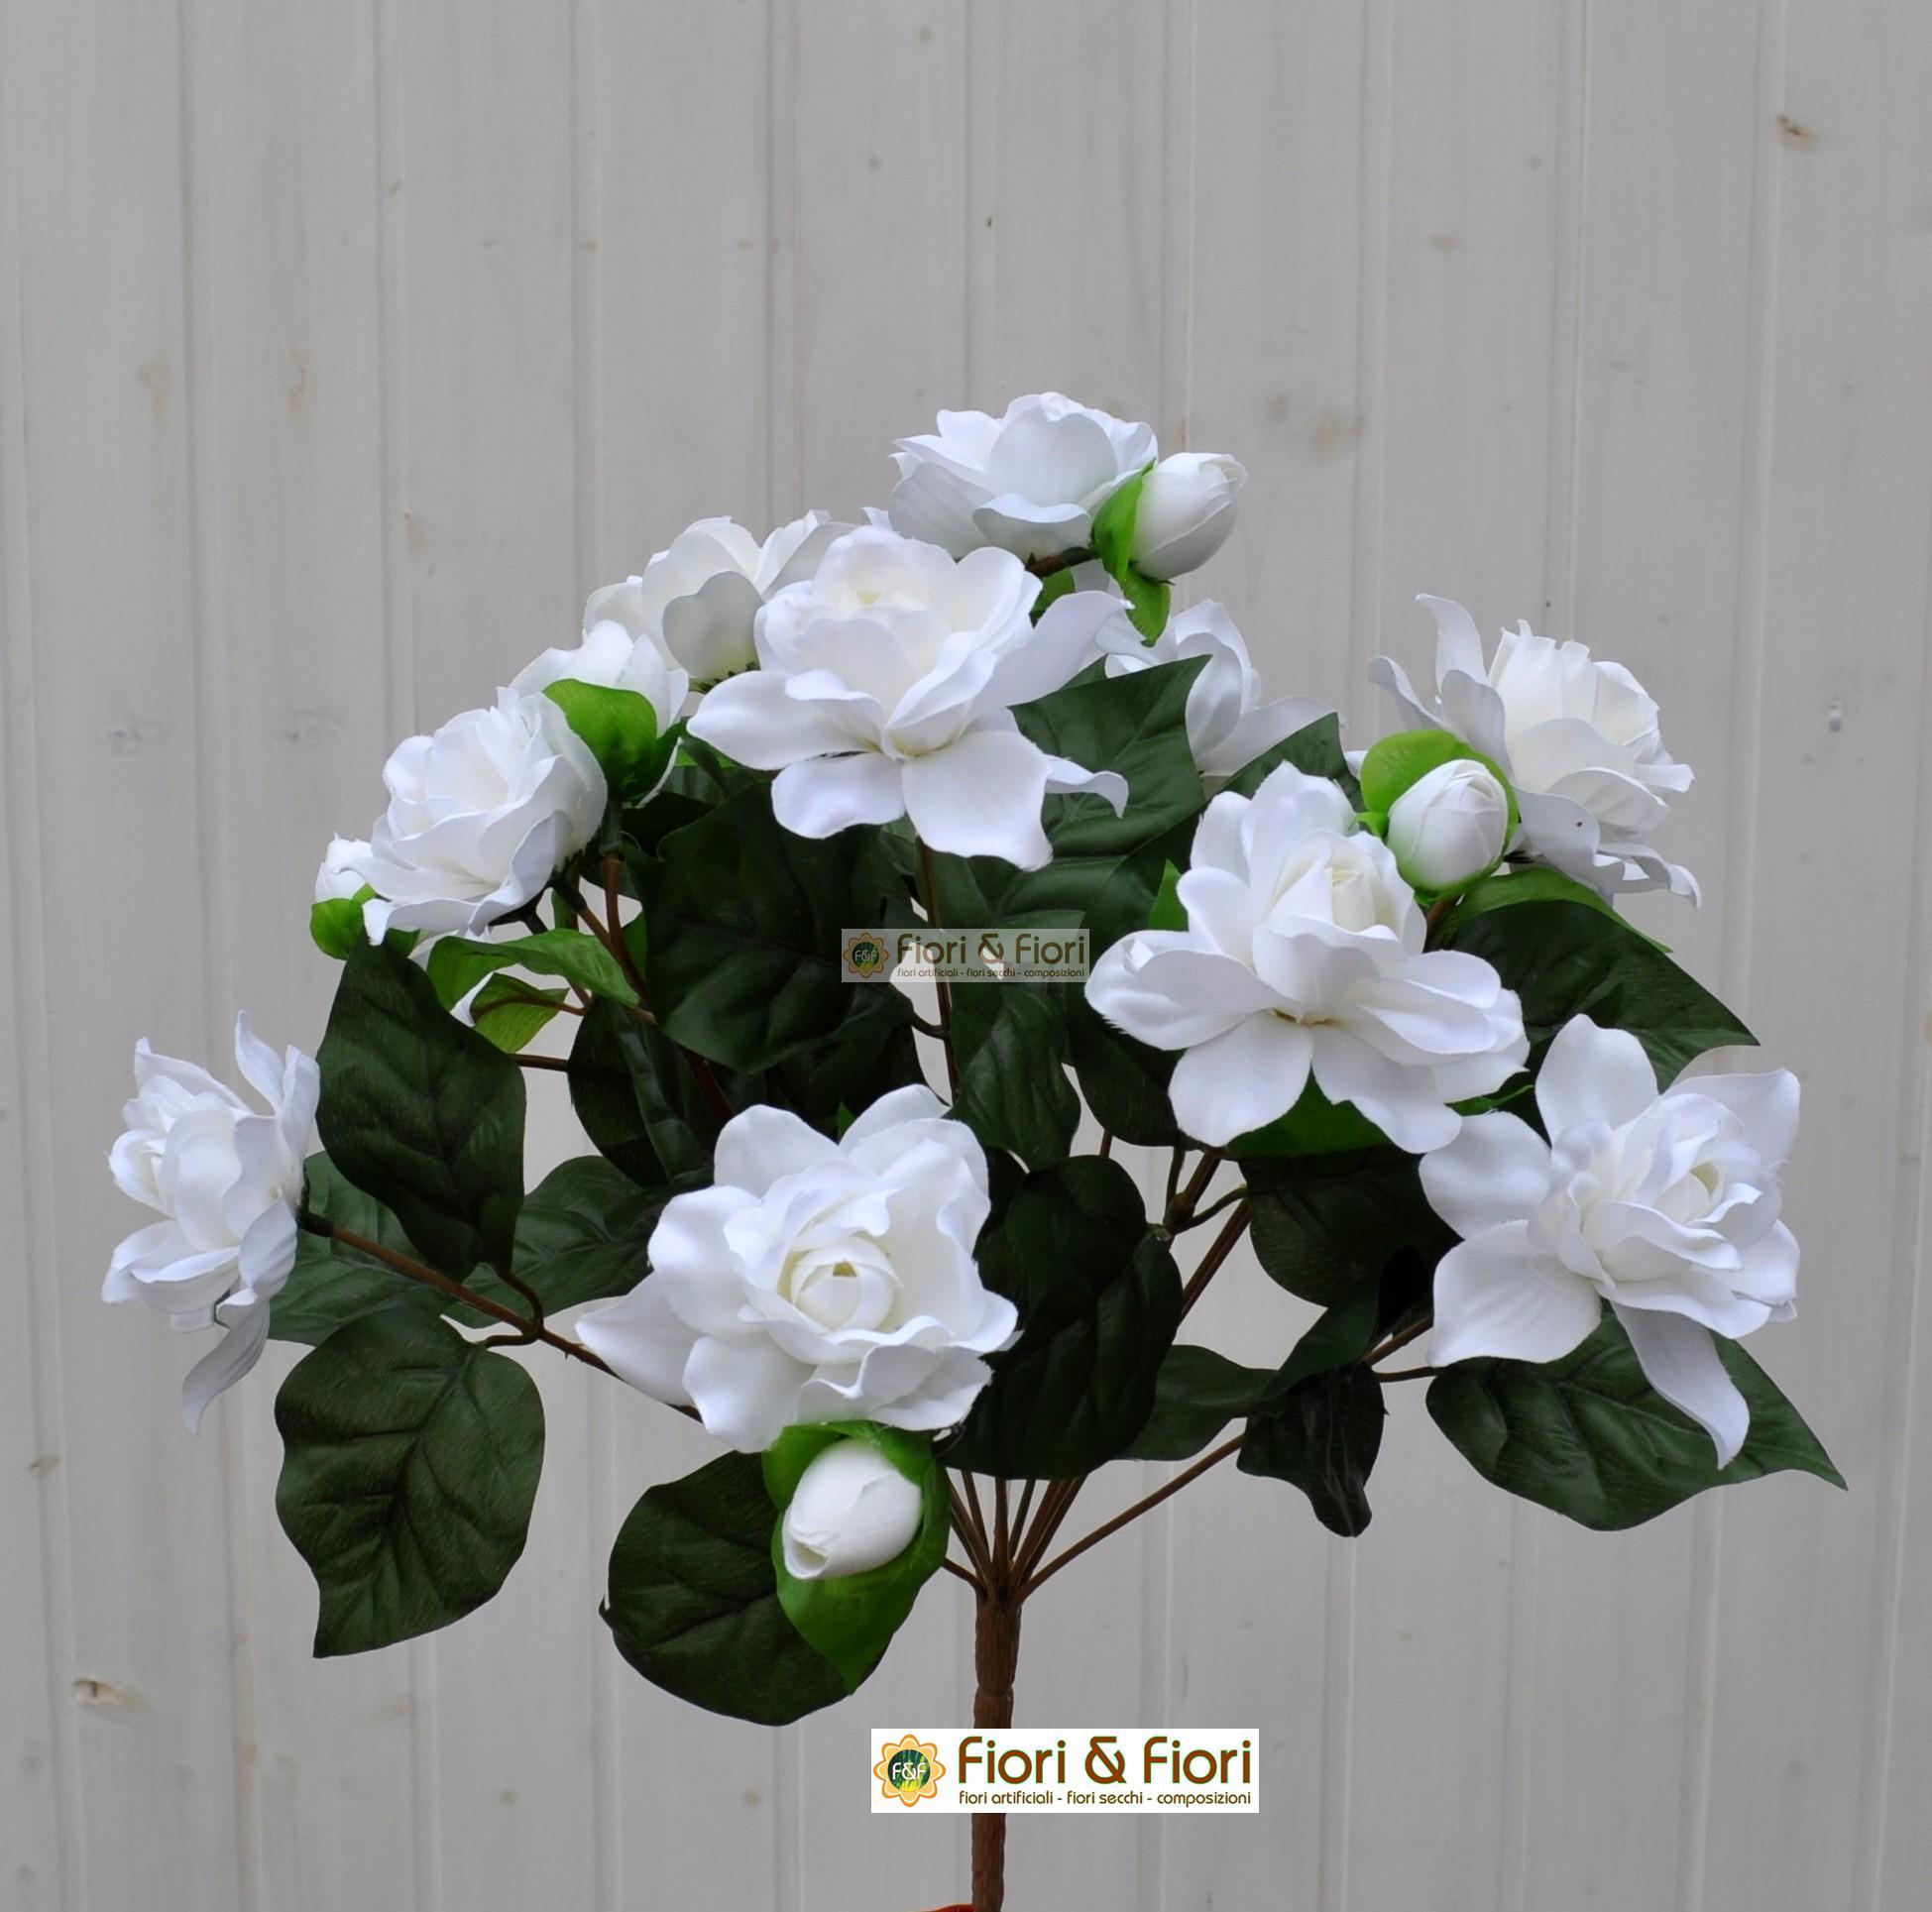 Gardenia artificiale jasminoides bianca per balconi e terrazzi - Gardenia pianta da interno o esterno ...